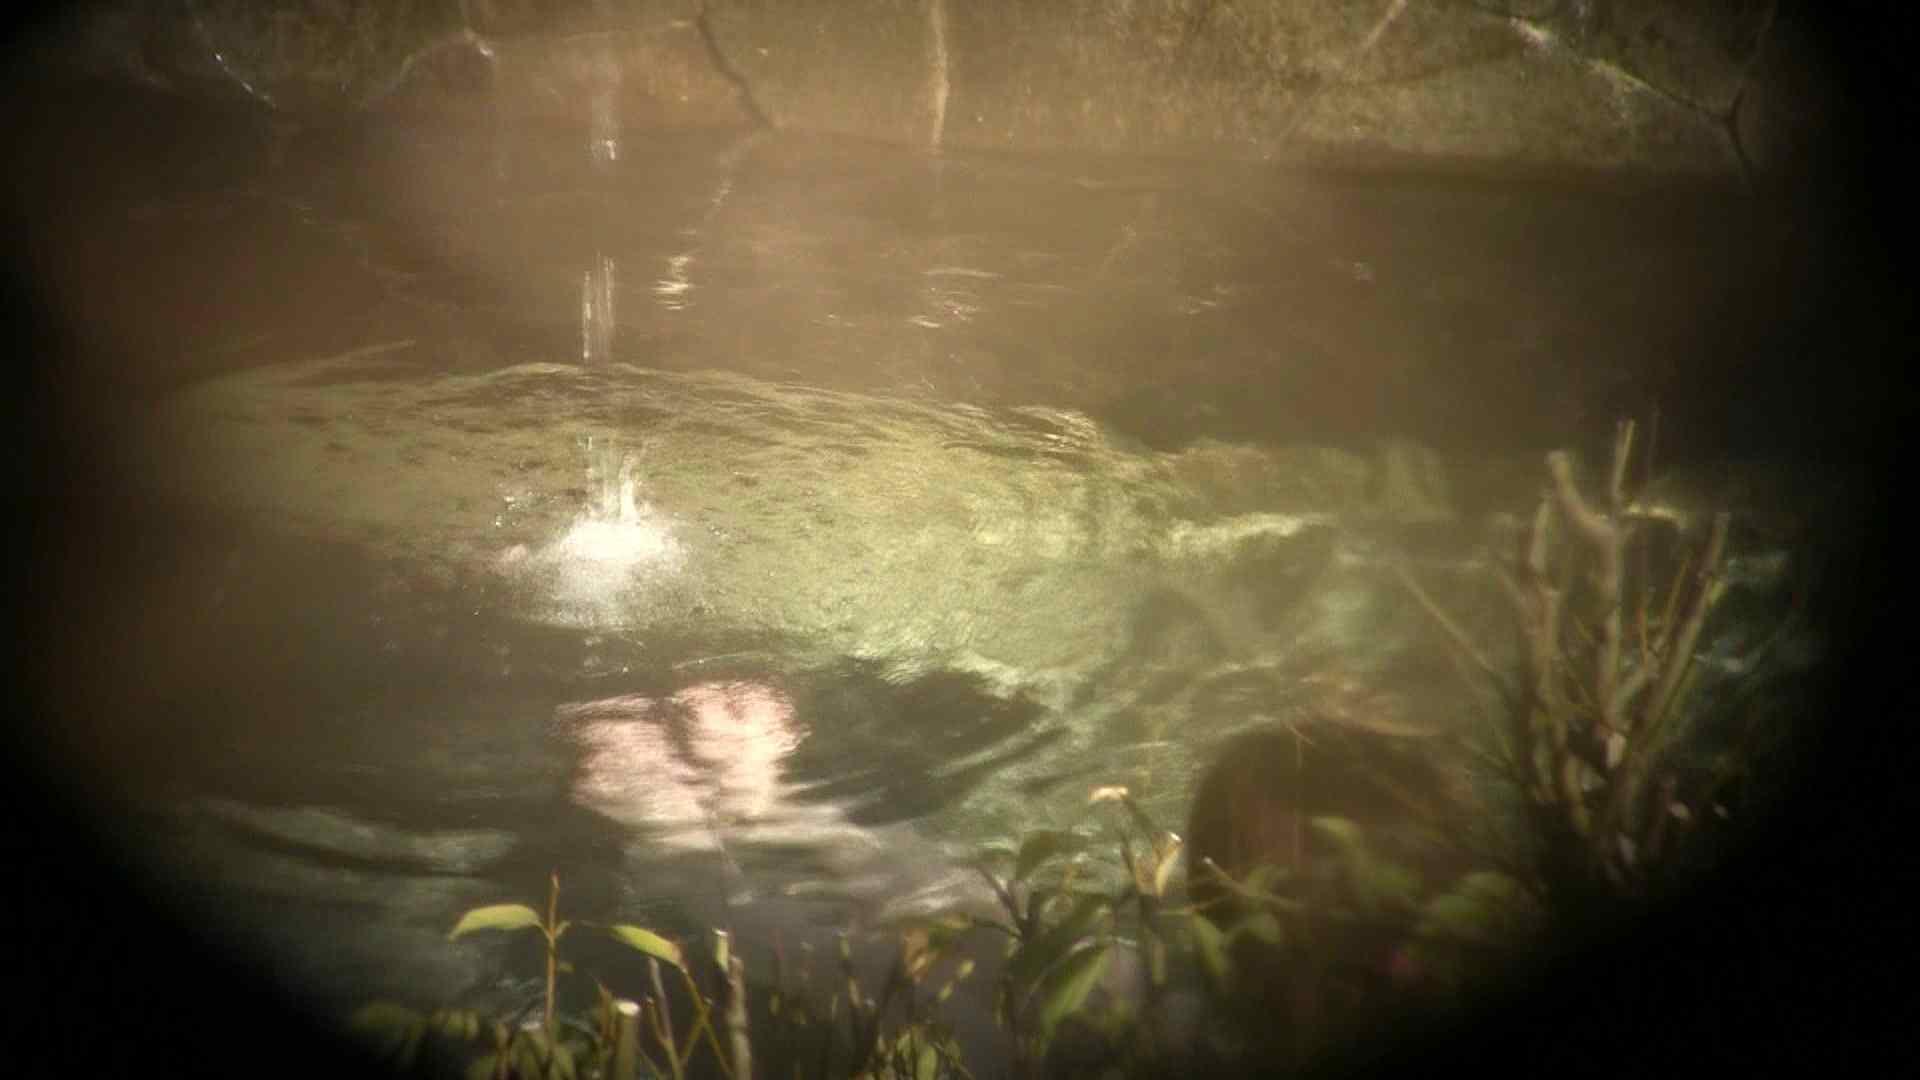 Aquaな露天風呂Vol.698 美しいOLの裸体 われめAV動画紹介 104pic 86